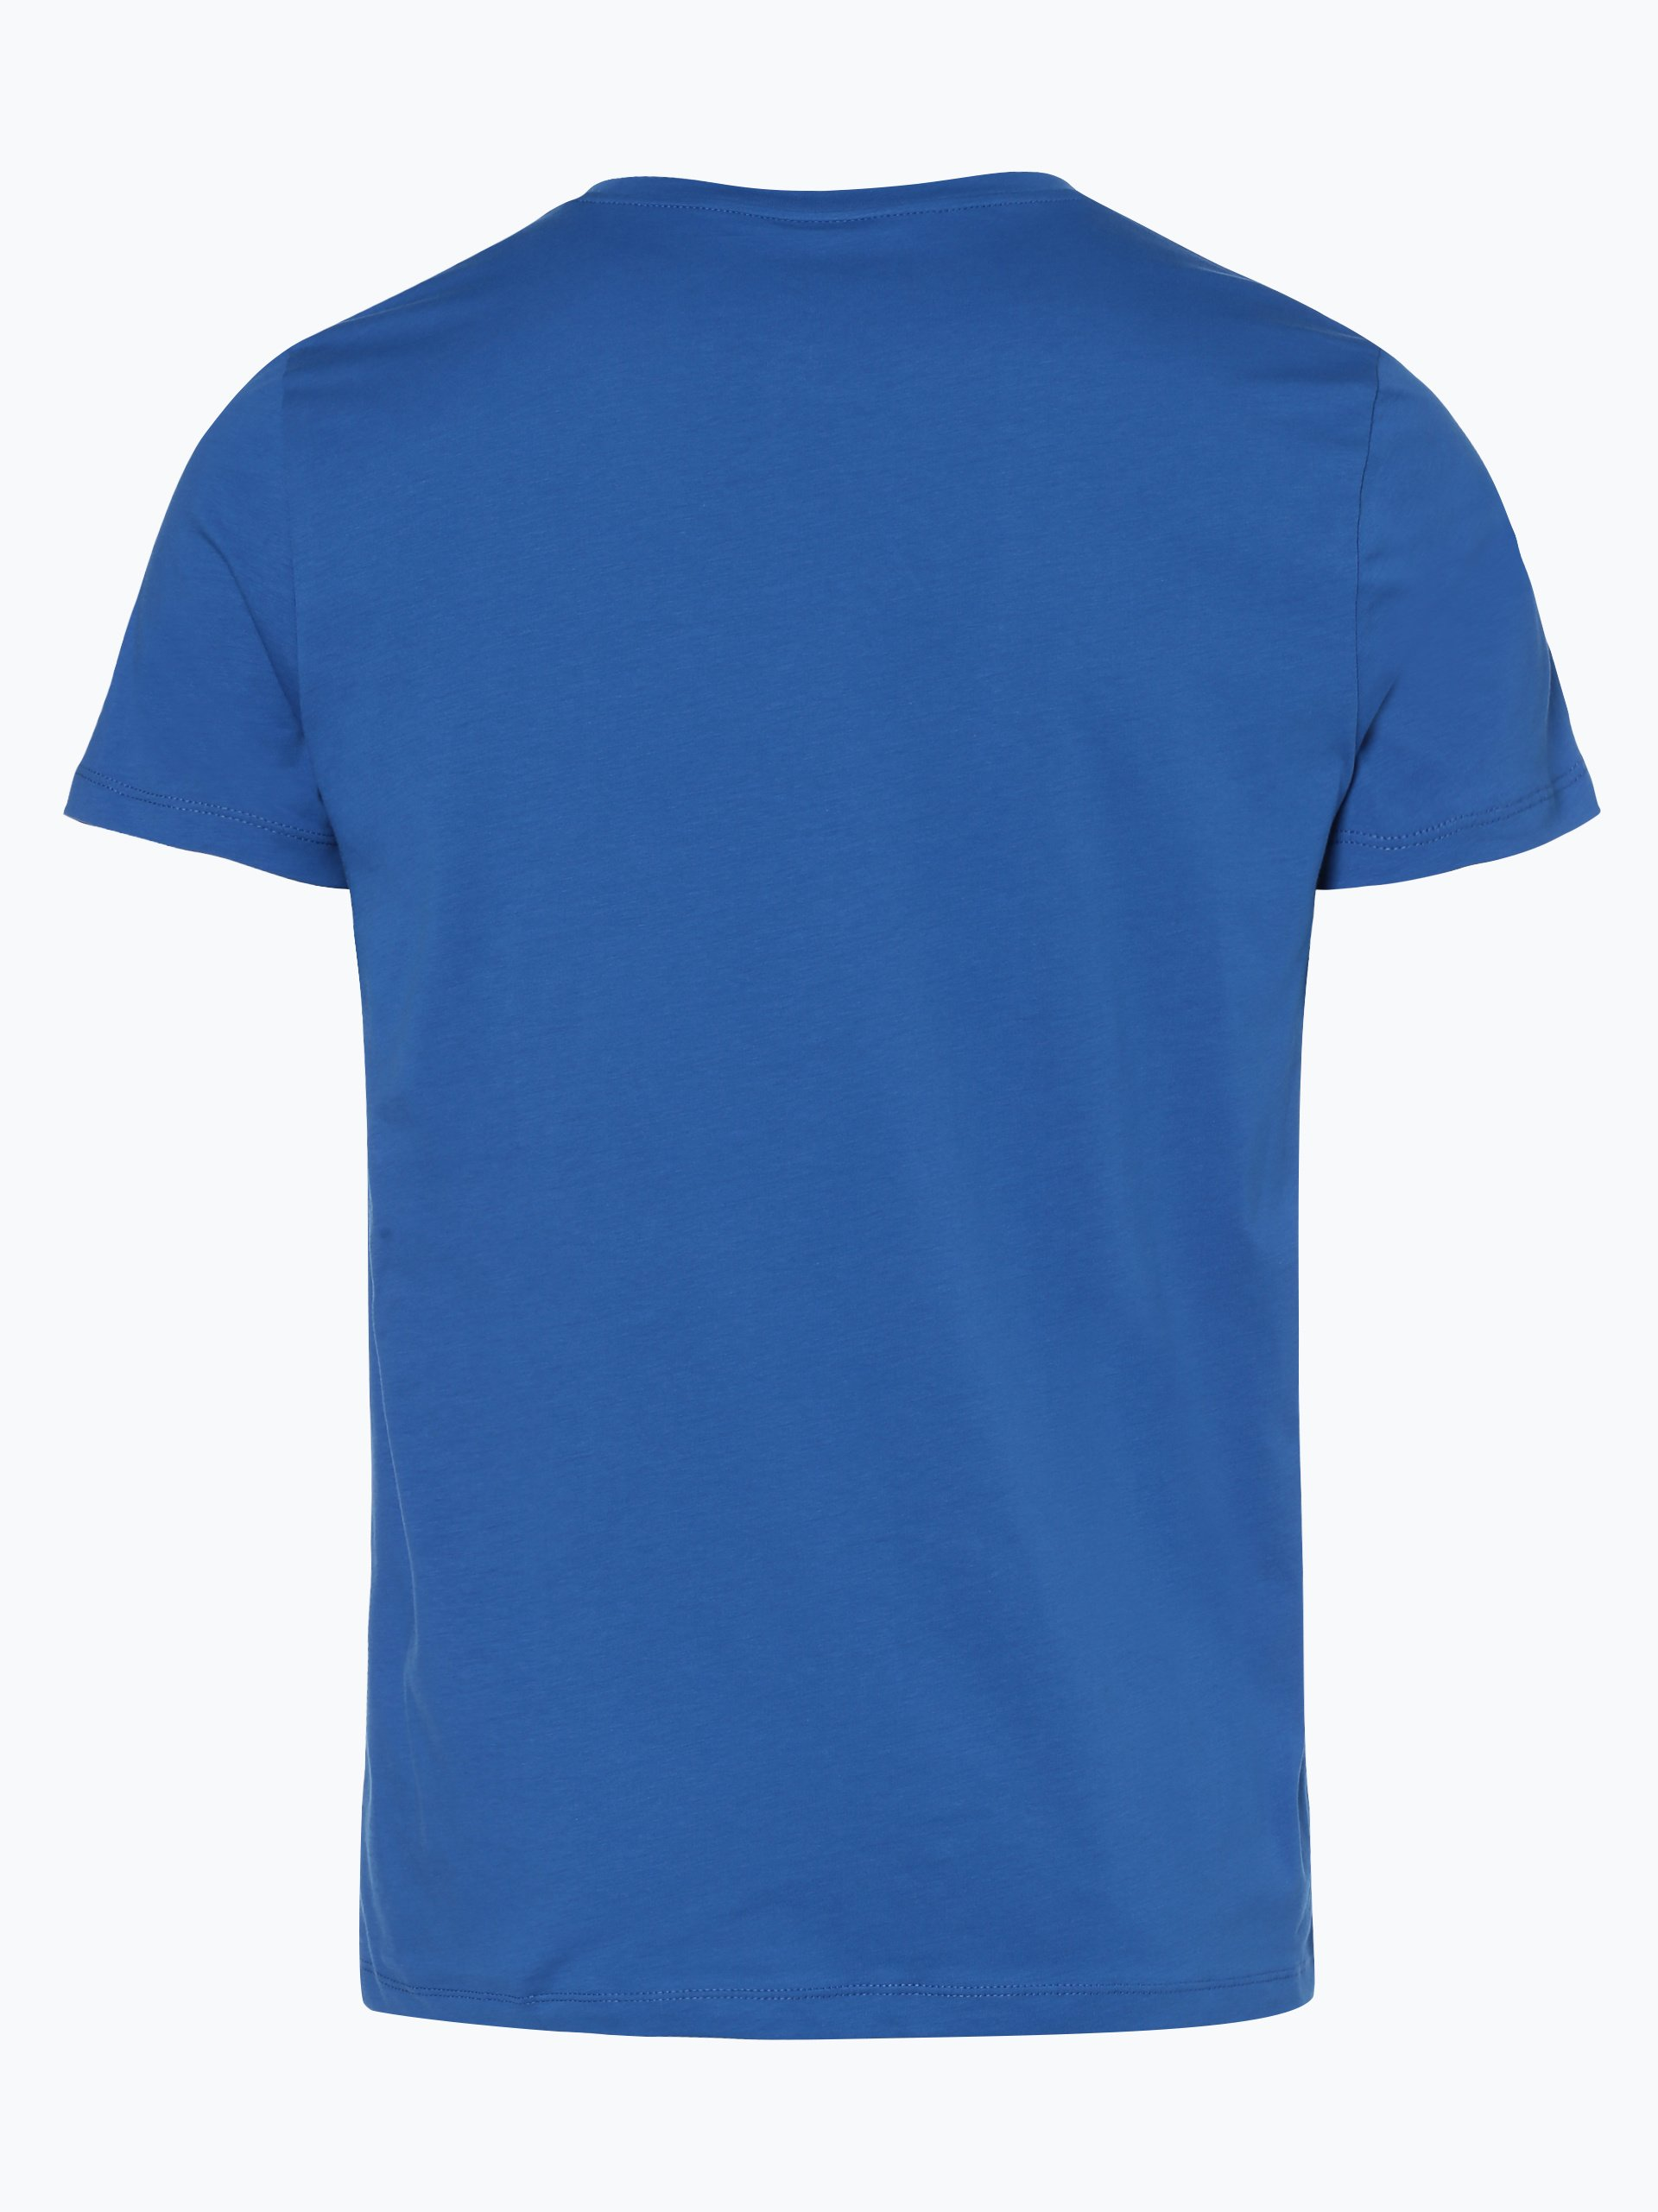 boss casual herren t shirt topwork 1 hellblau blau. Black Bedroom Furniture Sets. Home Design Ideas